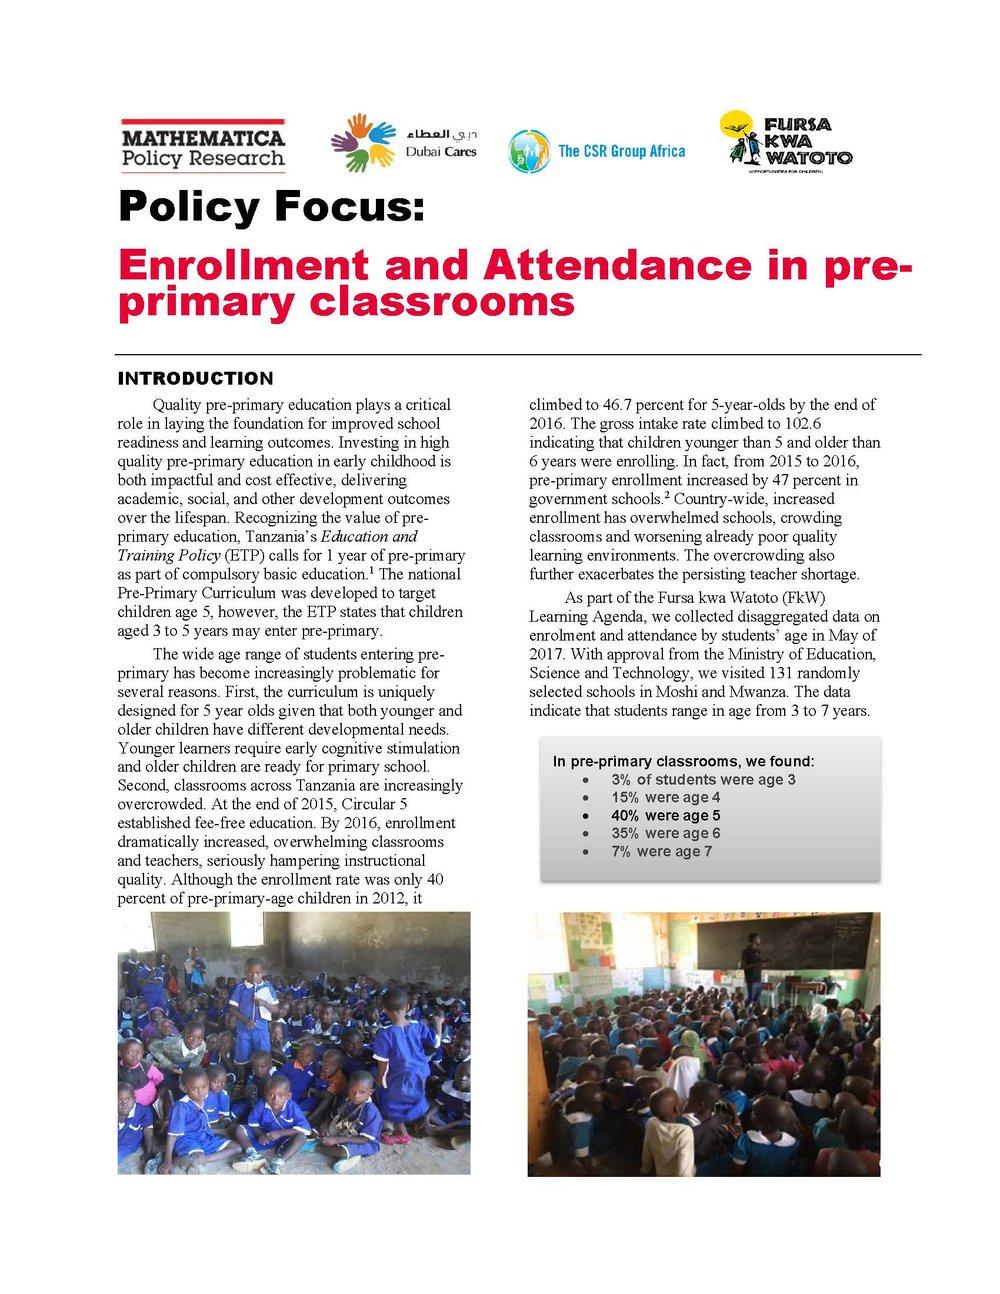 FkW Enrollment and Attendance Brief - Jan 2018